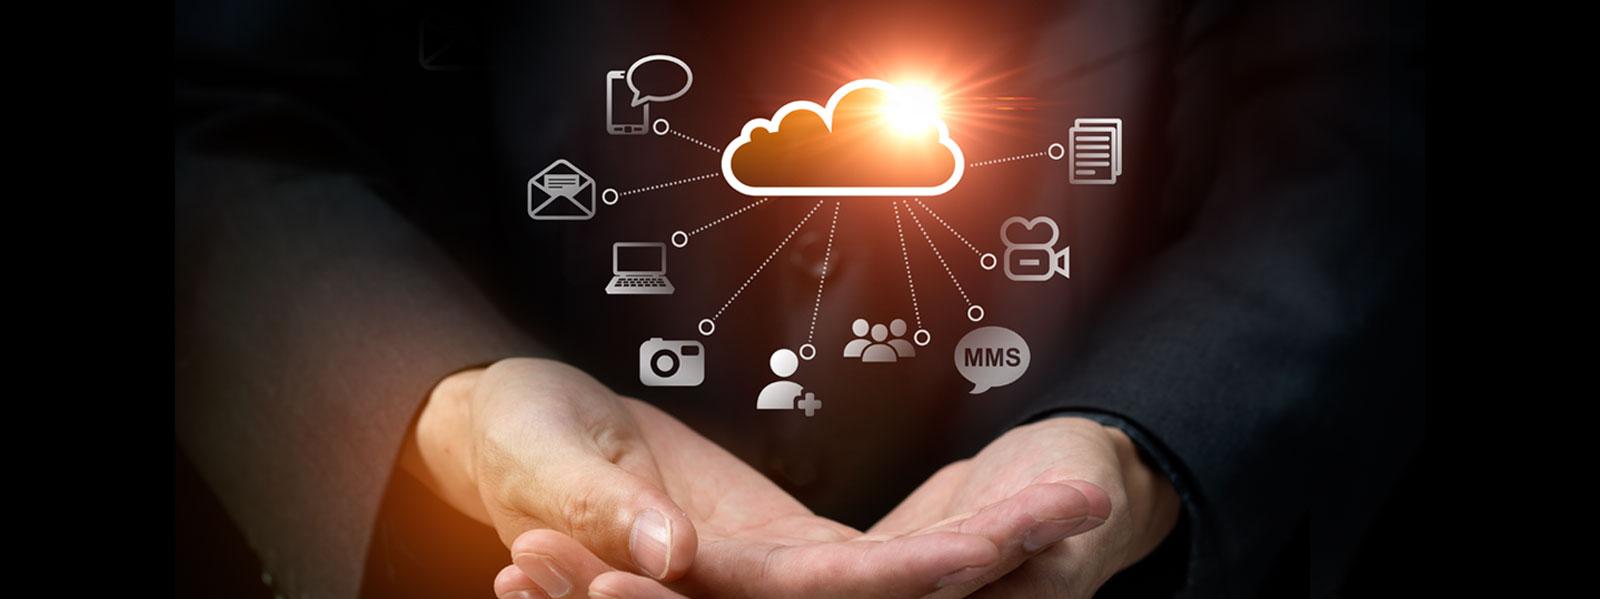 Application Modernization: che cos'è e perché aiuta i mainframe a entrare nell'era 4.0